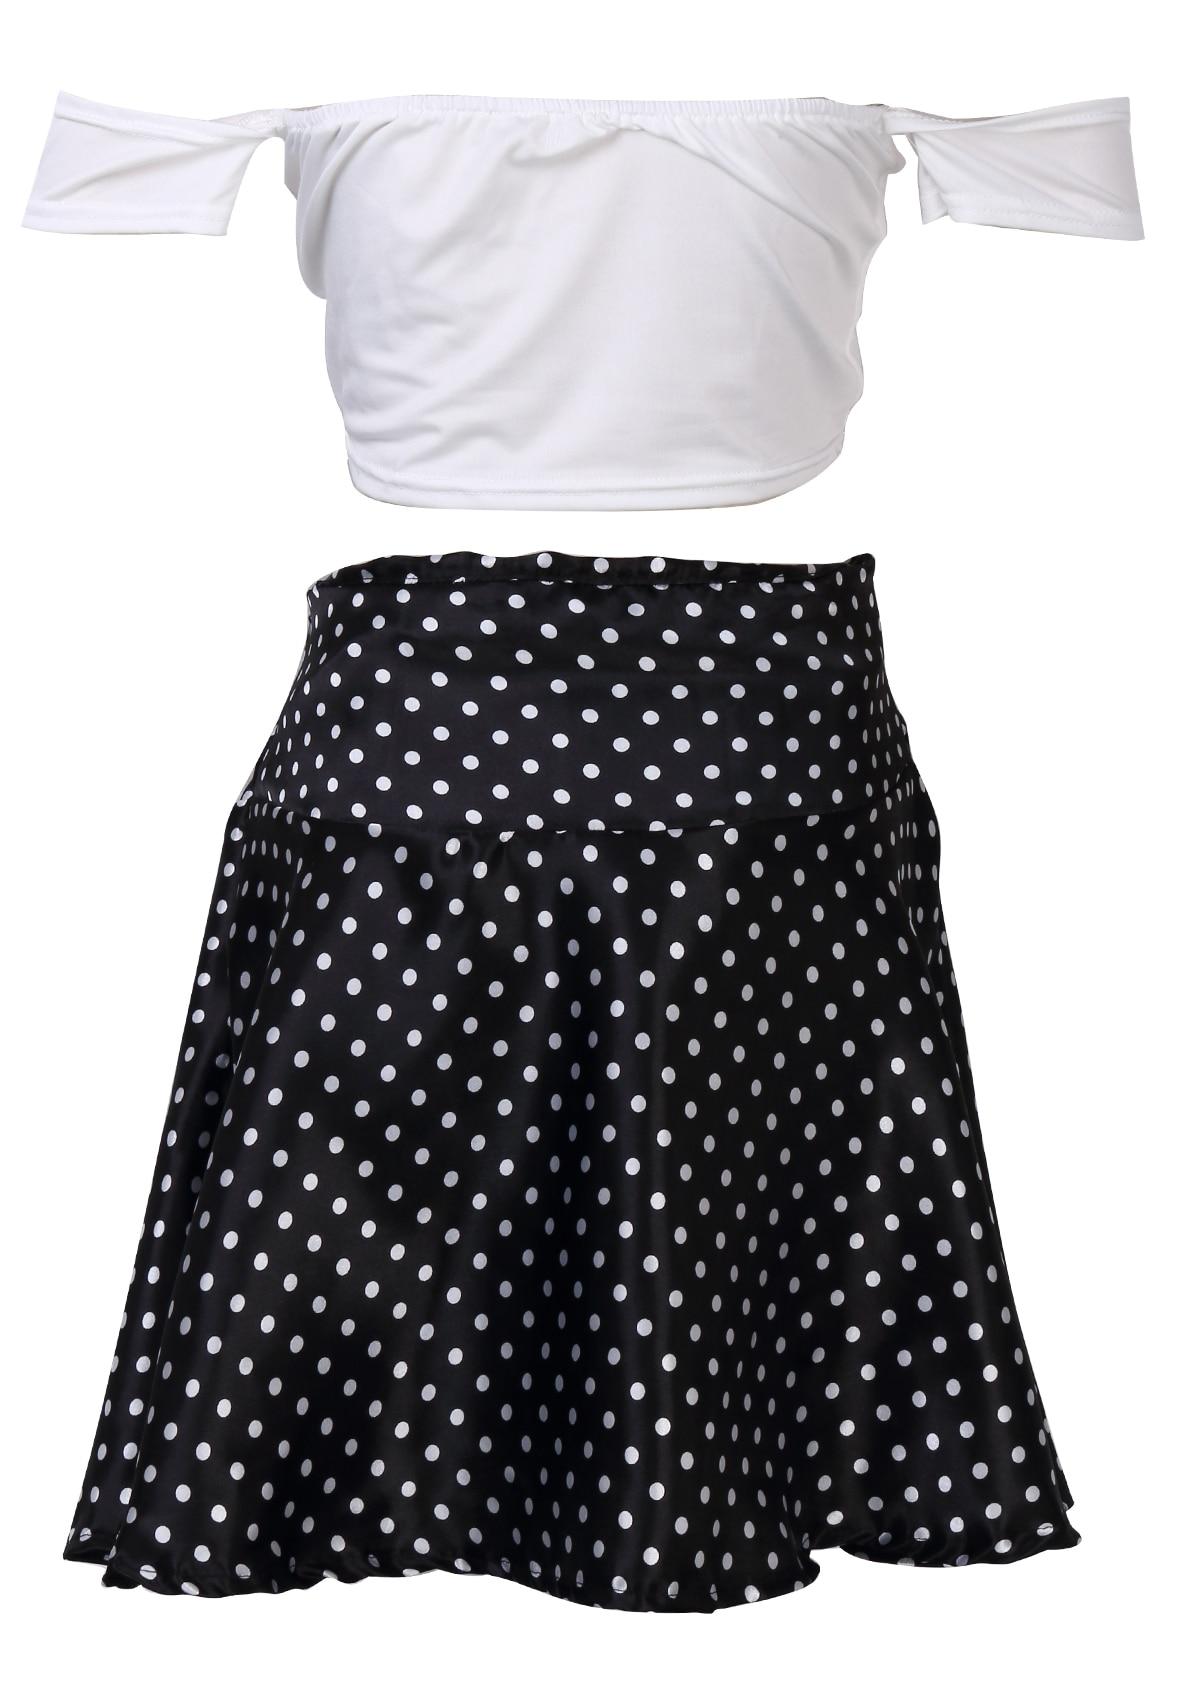 b403ae2ee0 2 Piece Sets Women short Sleeve Crop Top + Mini Dot Skirt Set High Waist  Bodycon Sexy-in Women's Sets from Women's Clothing on Aliexpress.com |  Alibaba ...